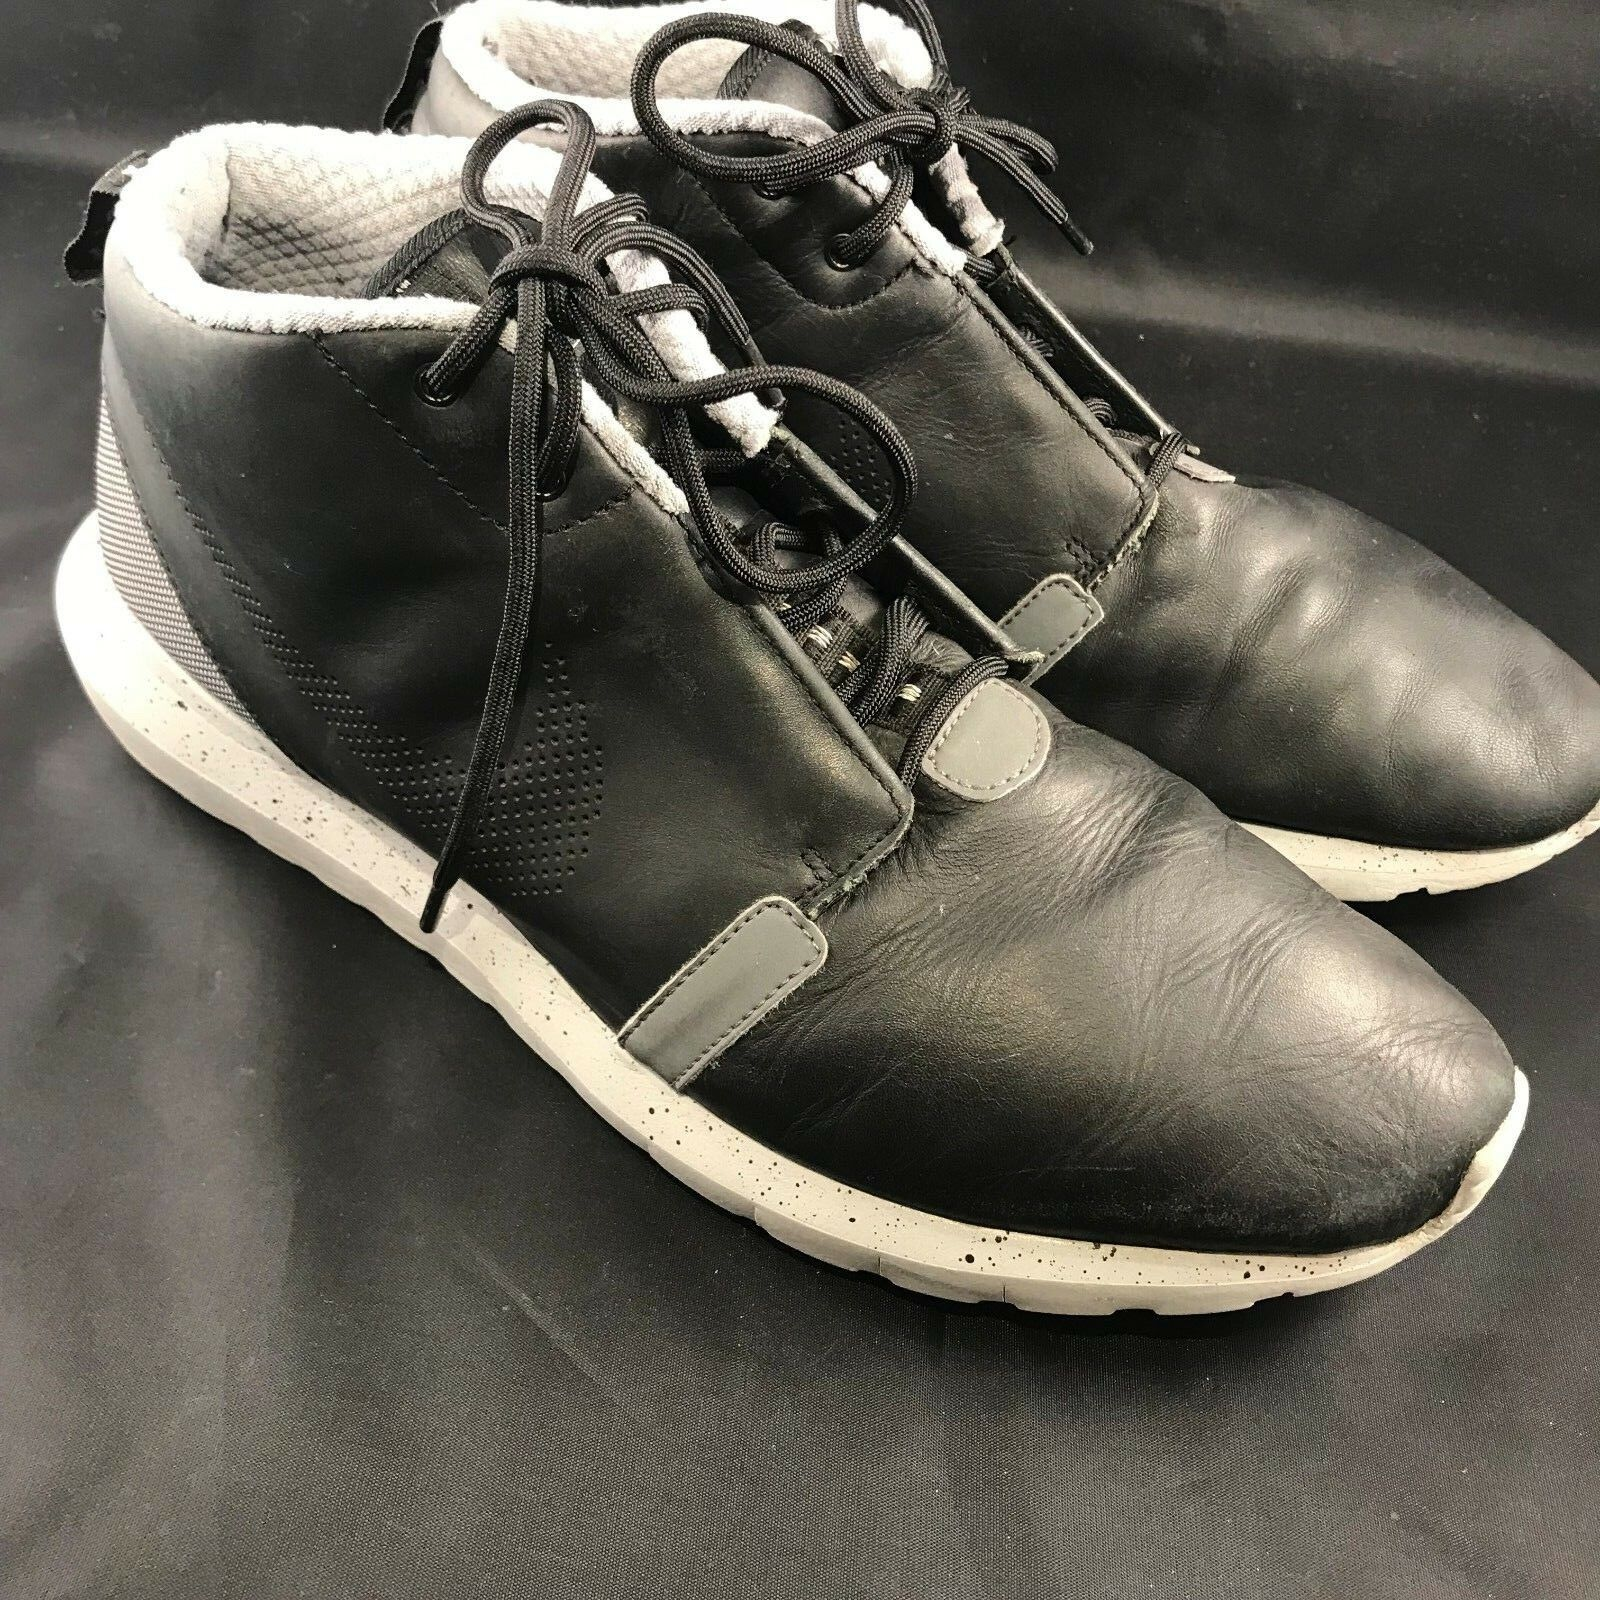 Rare Nike 11.5 Roshe Run NM Sneakerboot 684704-001 men's Sz 11.5 Nike black Gray Cement c40710